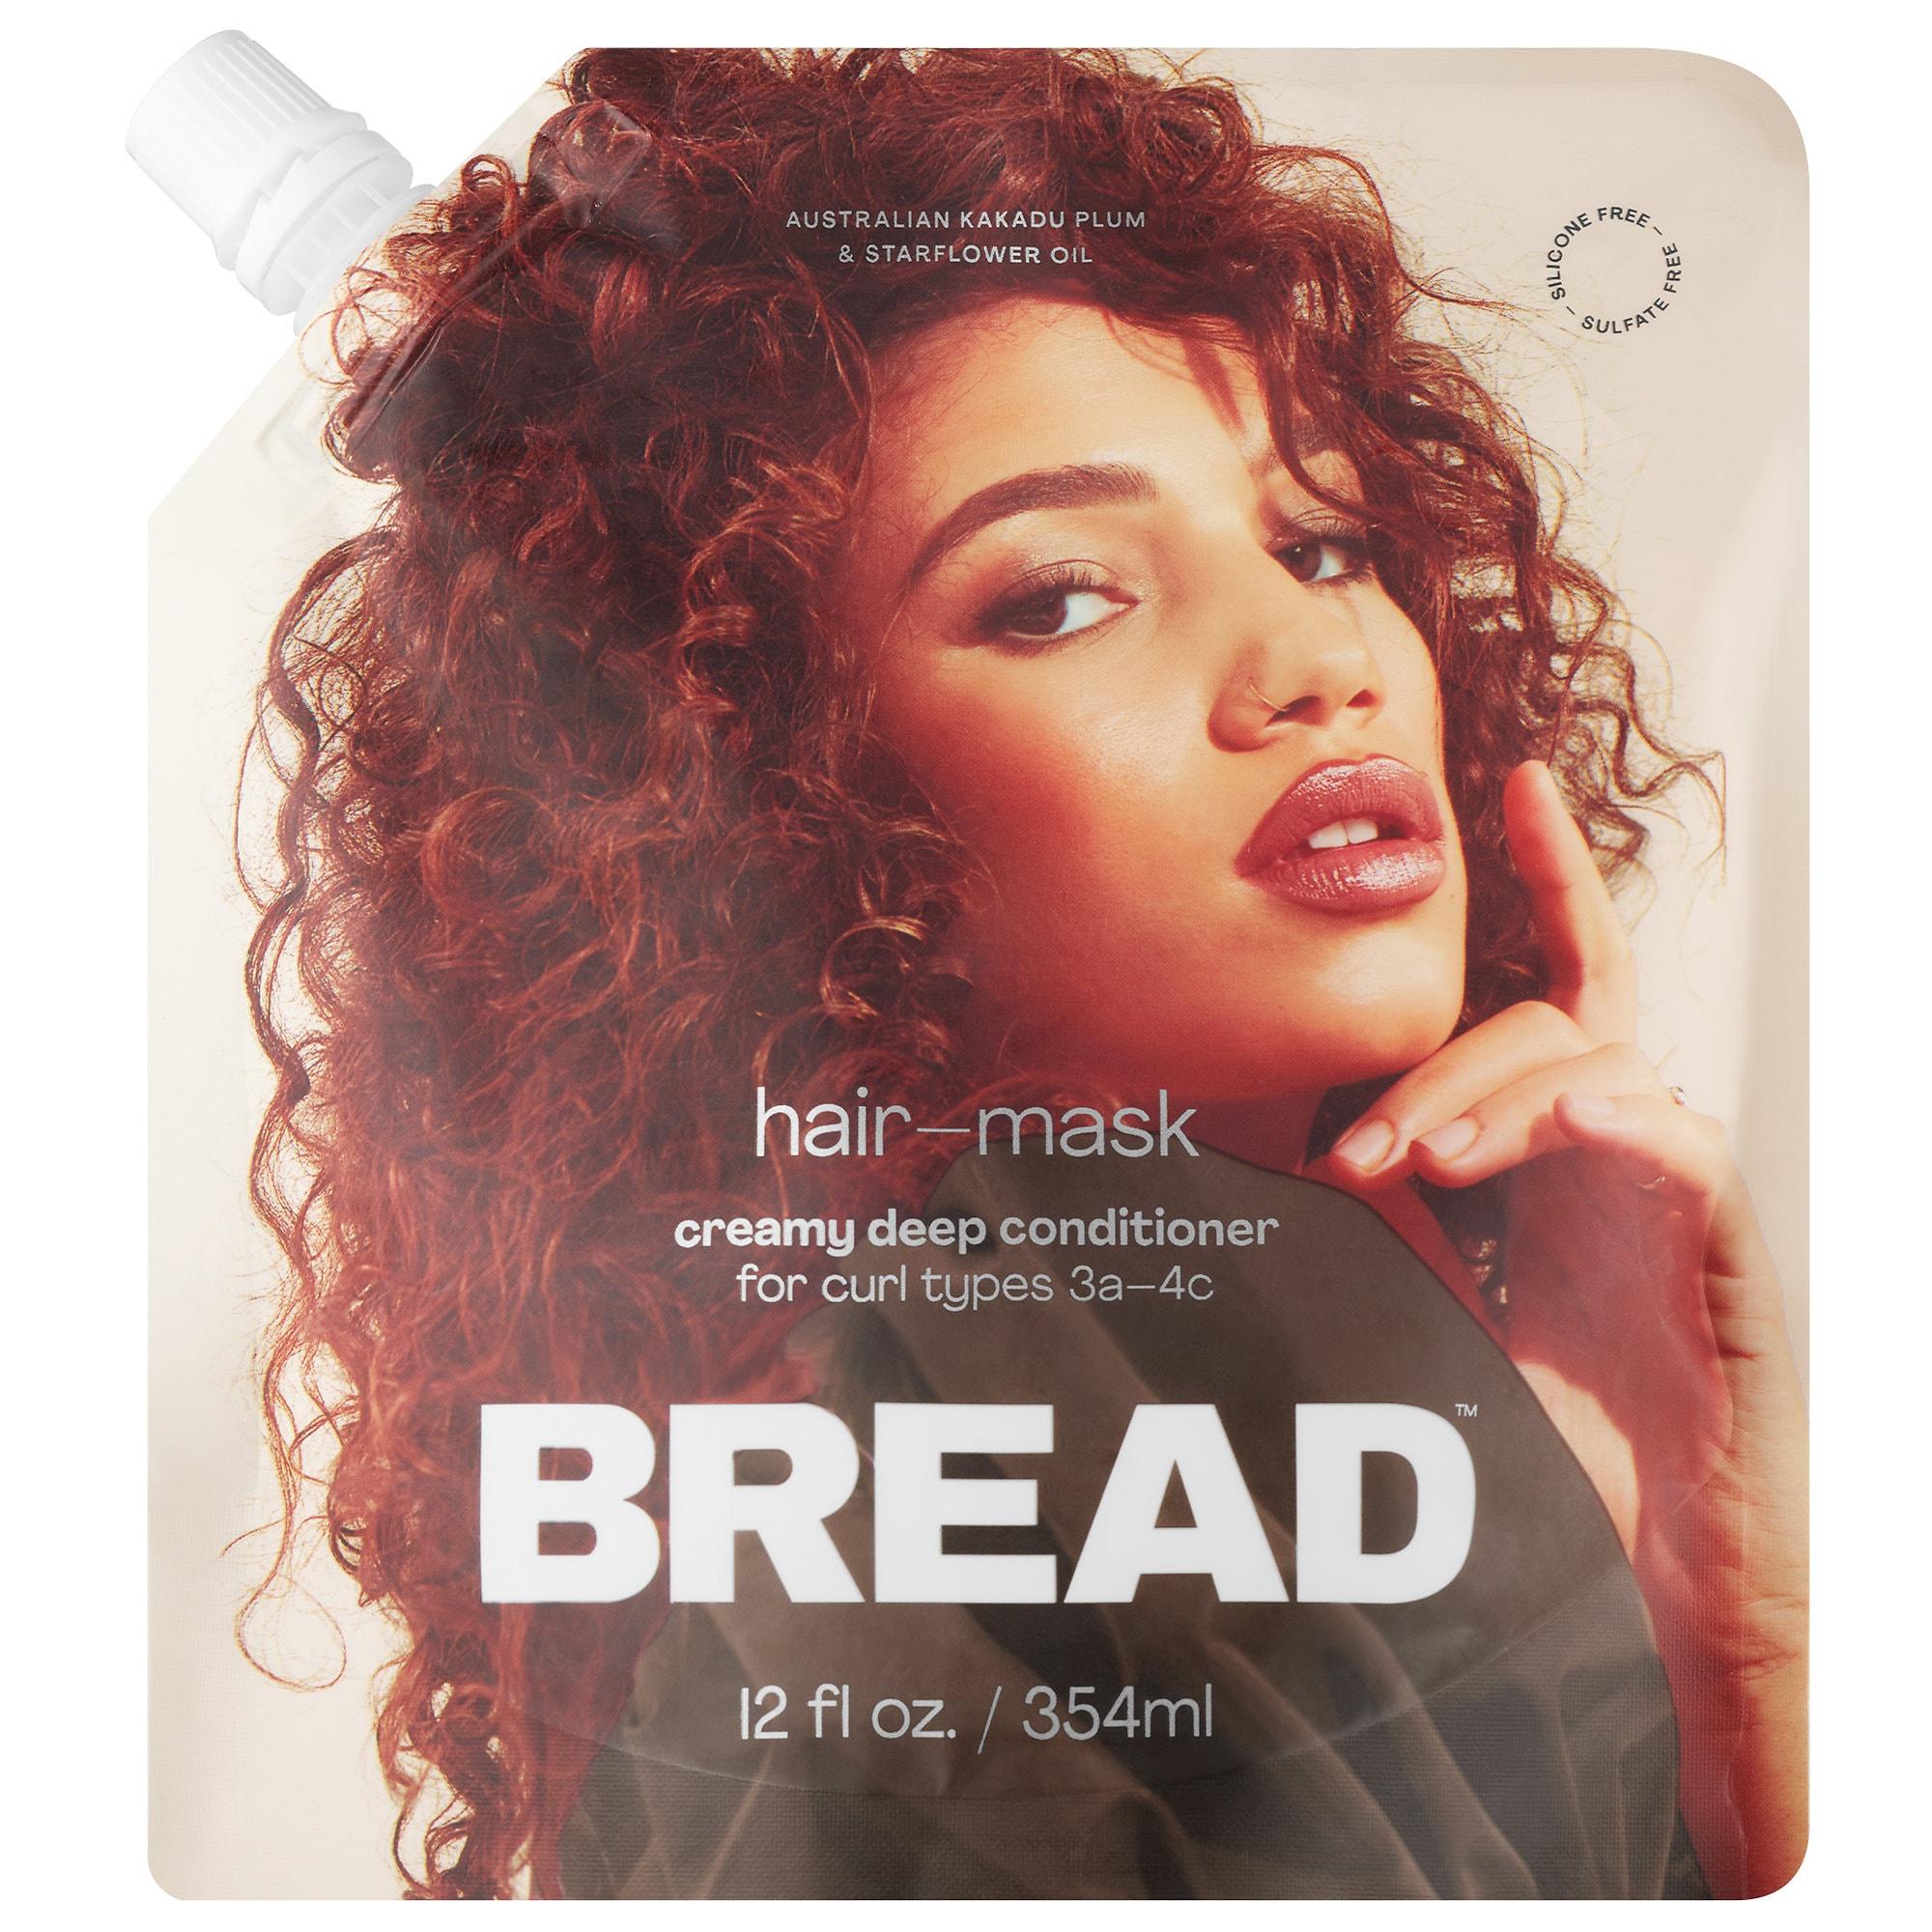 Bread Beauty Supply - Hair Mask Creamy Deep Conditioner